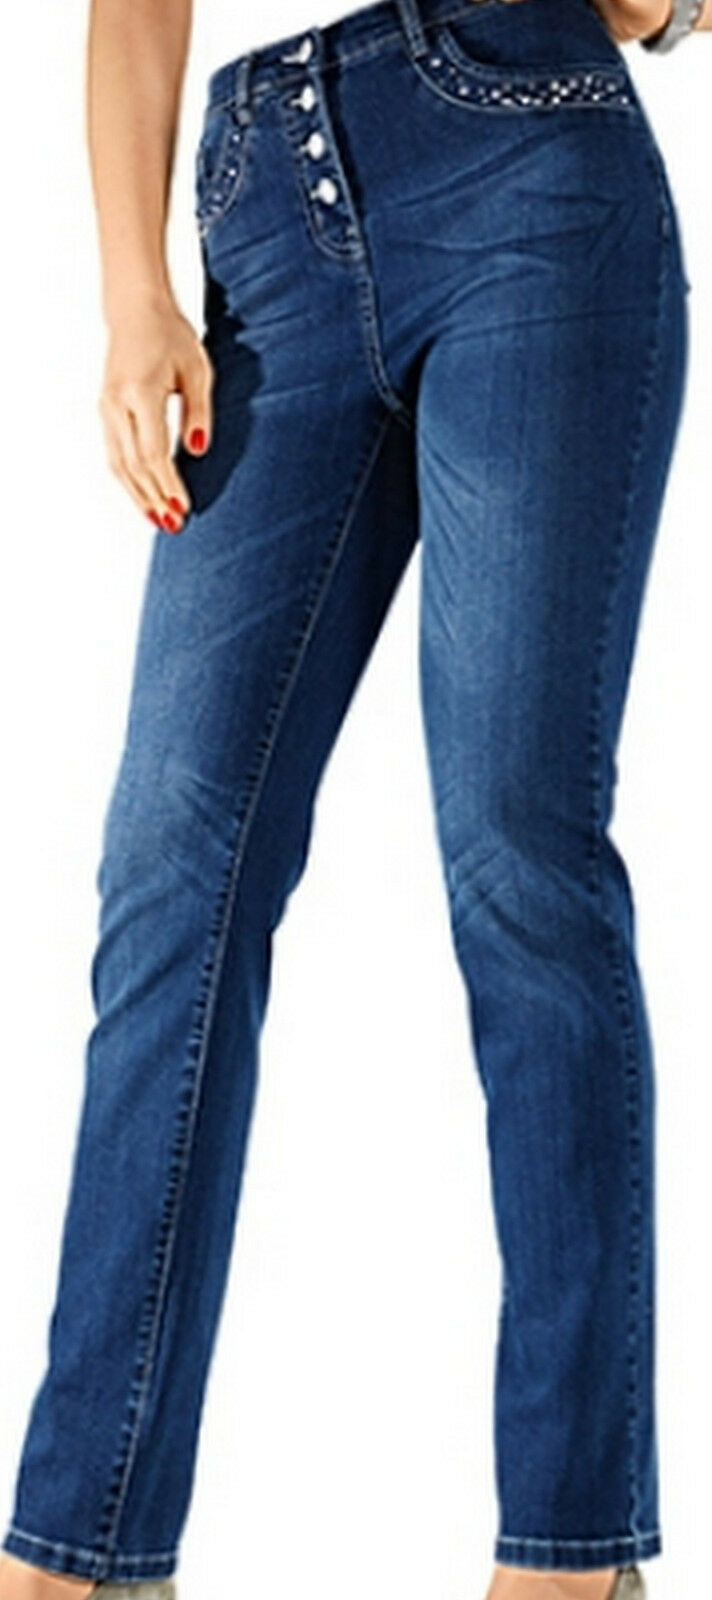 "waist to 38/"" BP DOUBLE satin panties inside panties BN baby pink SSX 3"